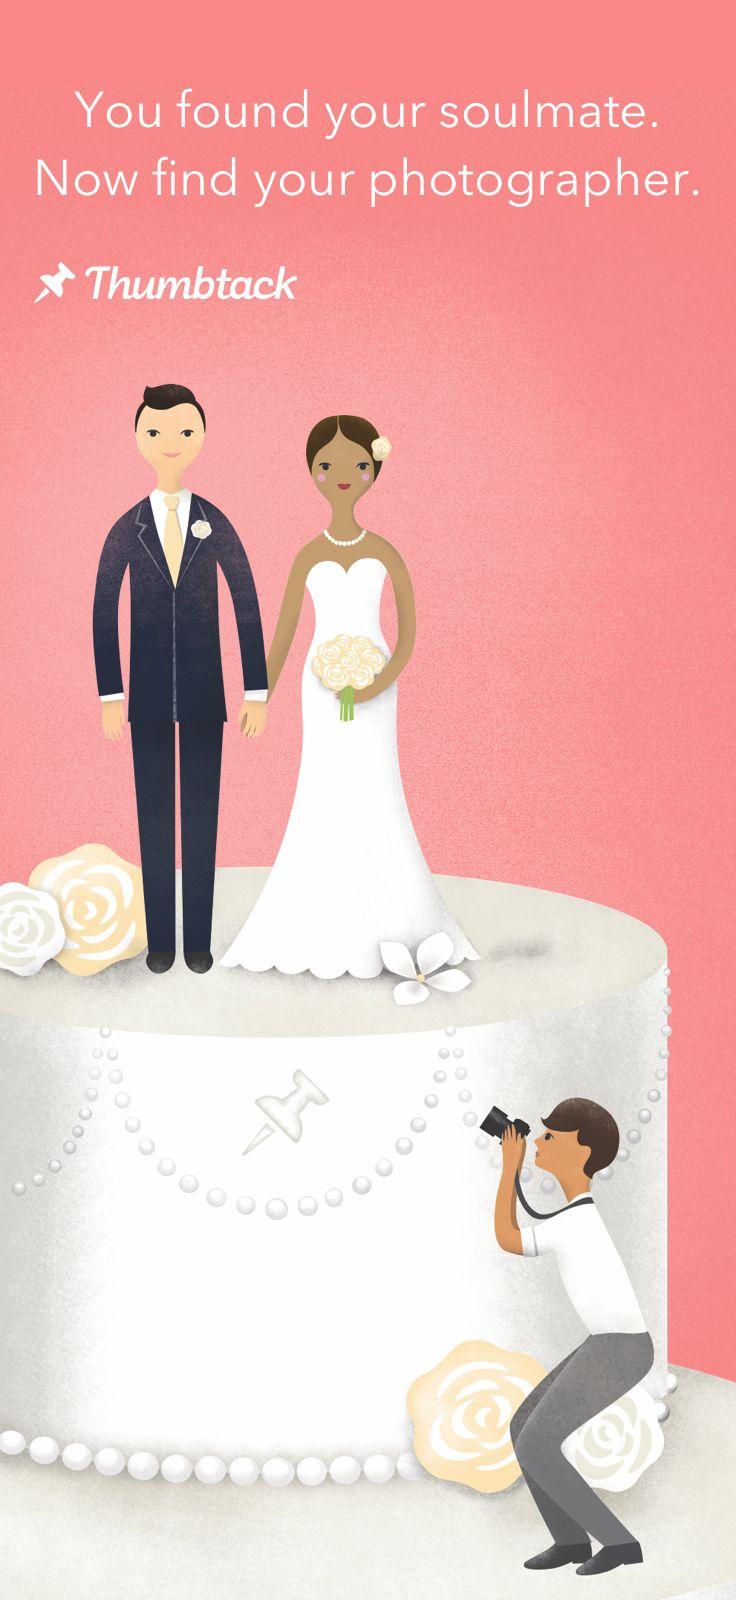 17 mejores imágenes sobre Wedding Ideas en Pinterest | Bodas ...